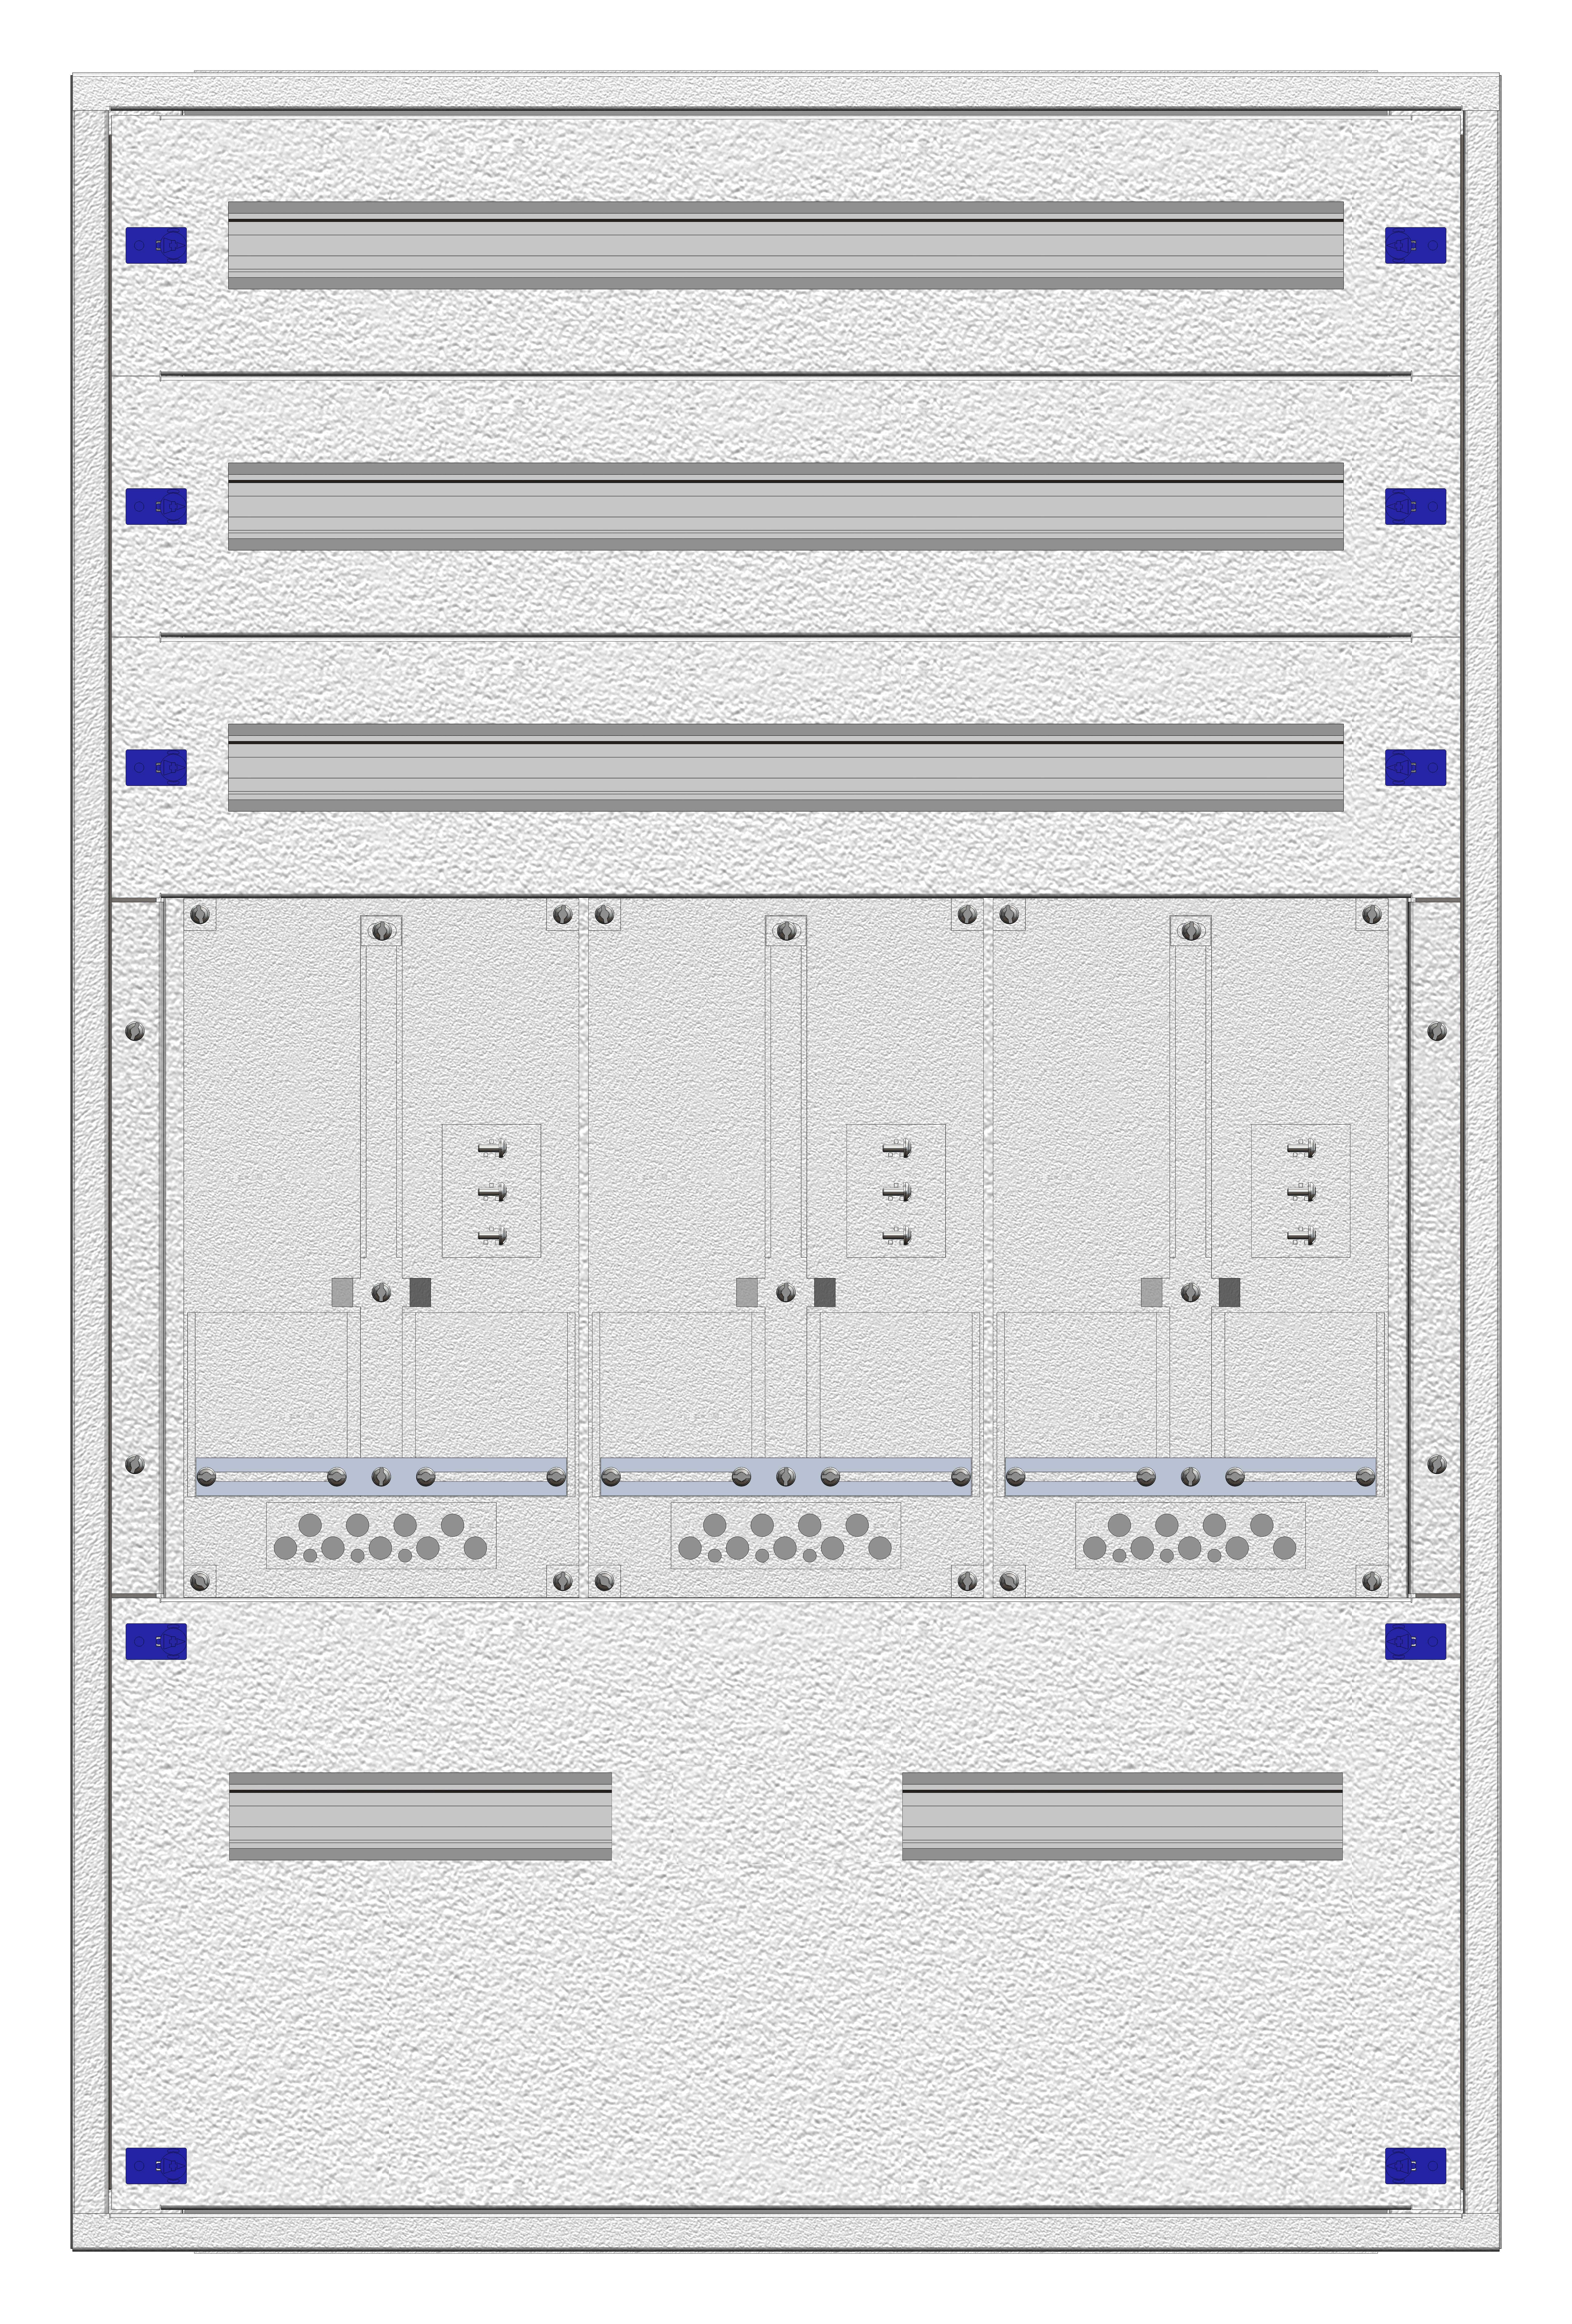 1 Stk Eco-AP-Verteiler 3A24 + Rückwand OÖ/SBG– RAL7035 IL865324--